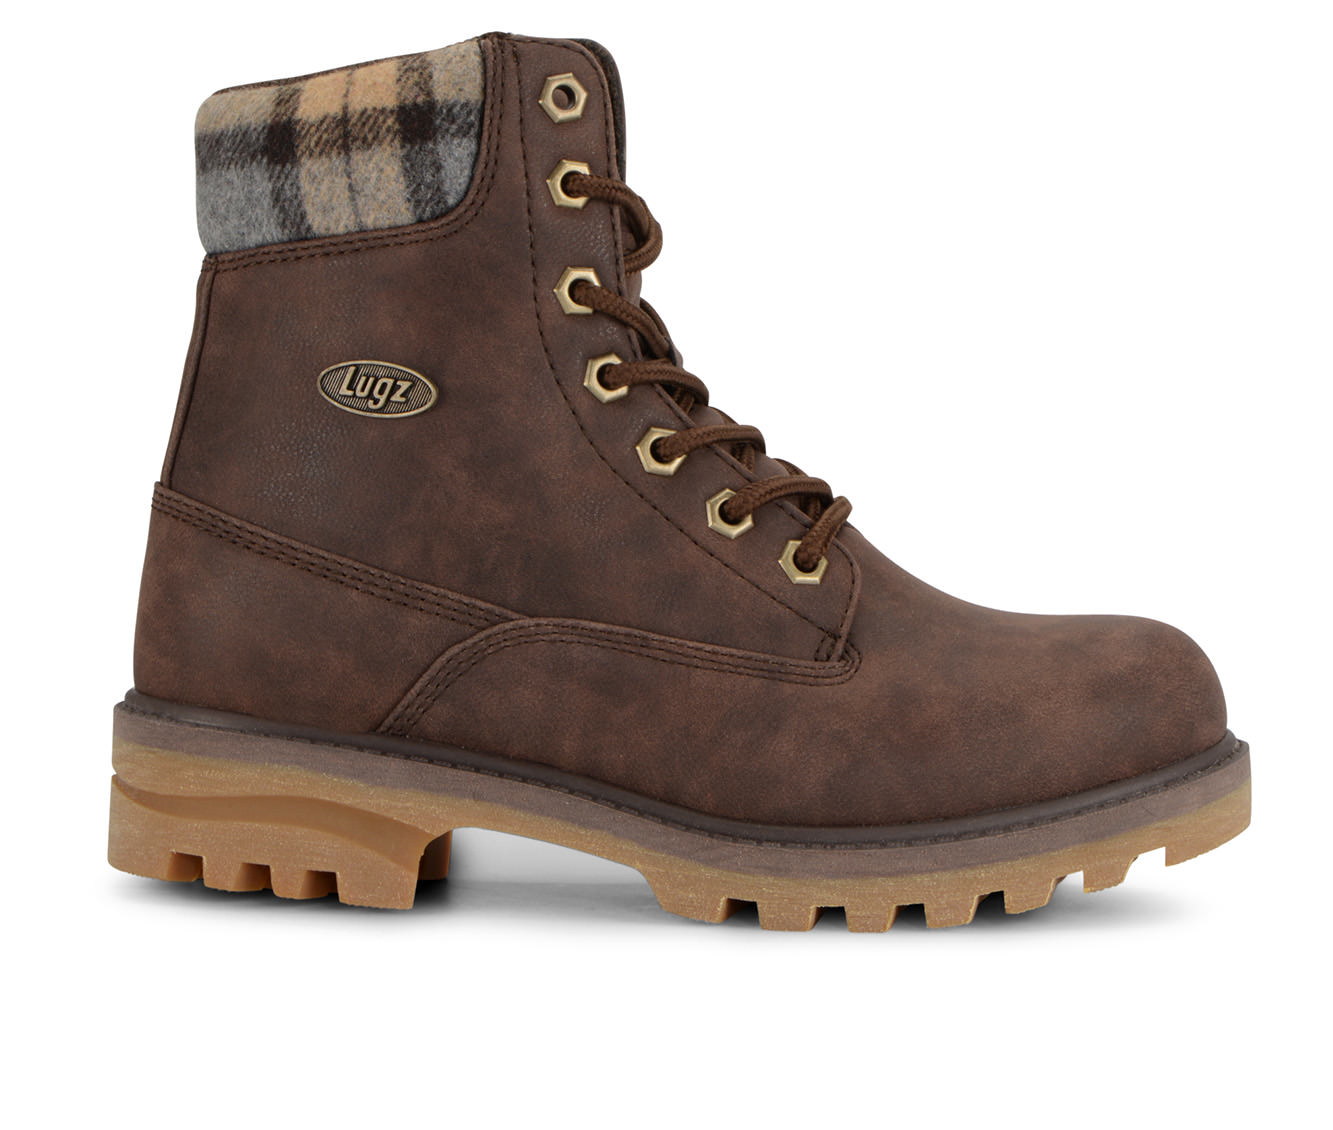 Lugz Empire Hi Women's Boot (Brown Faux Leather)